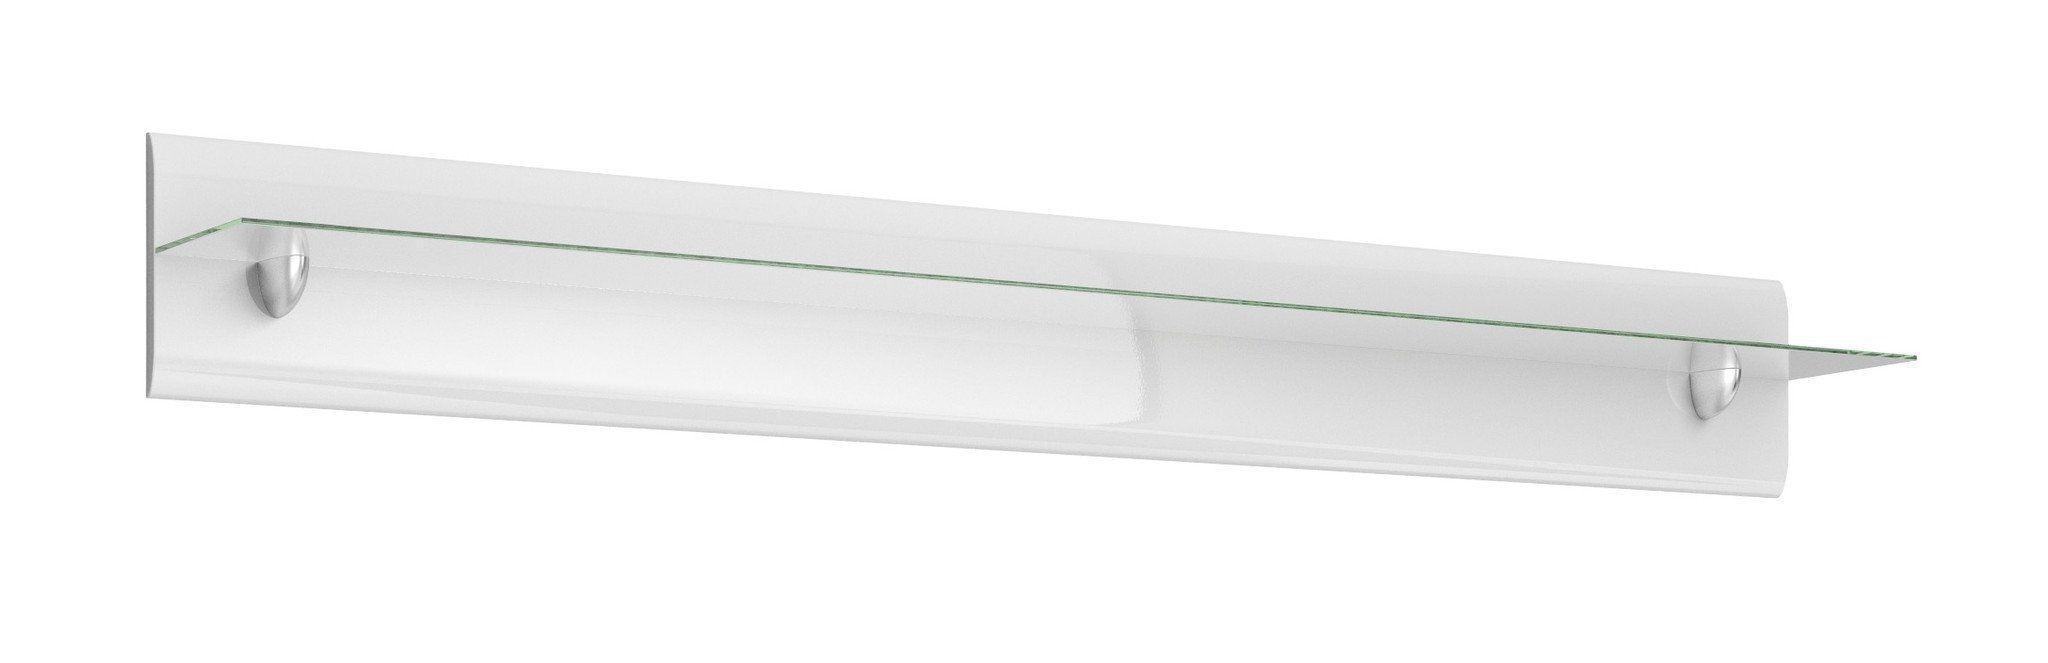 Hektor 02 Shelf 170cm - White Gloss / 170cm